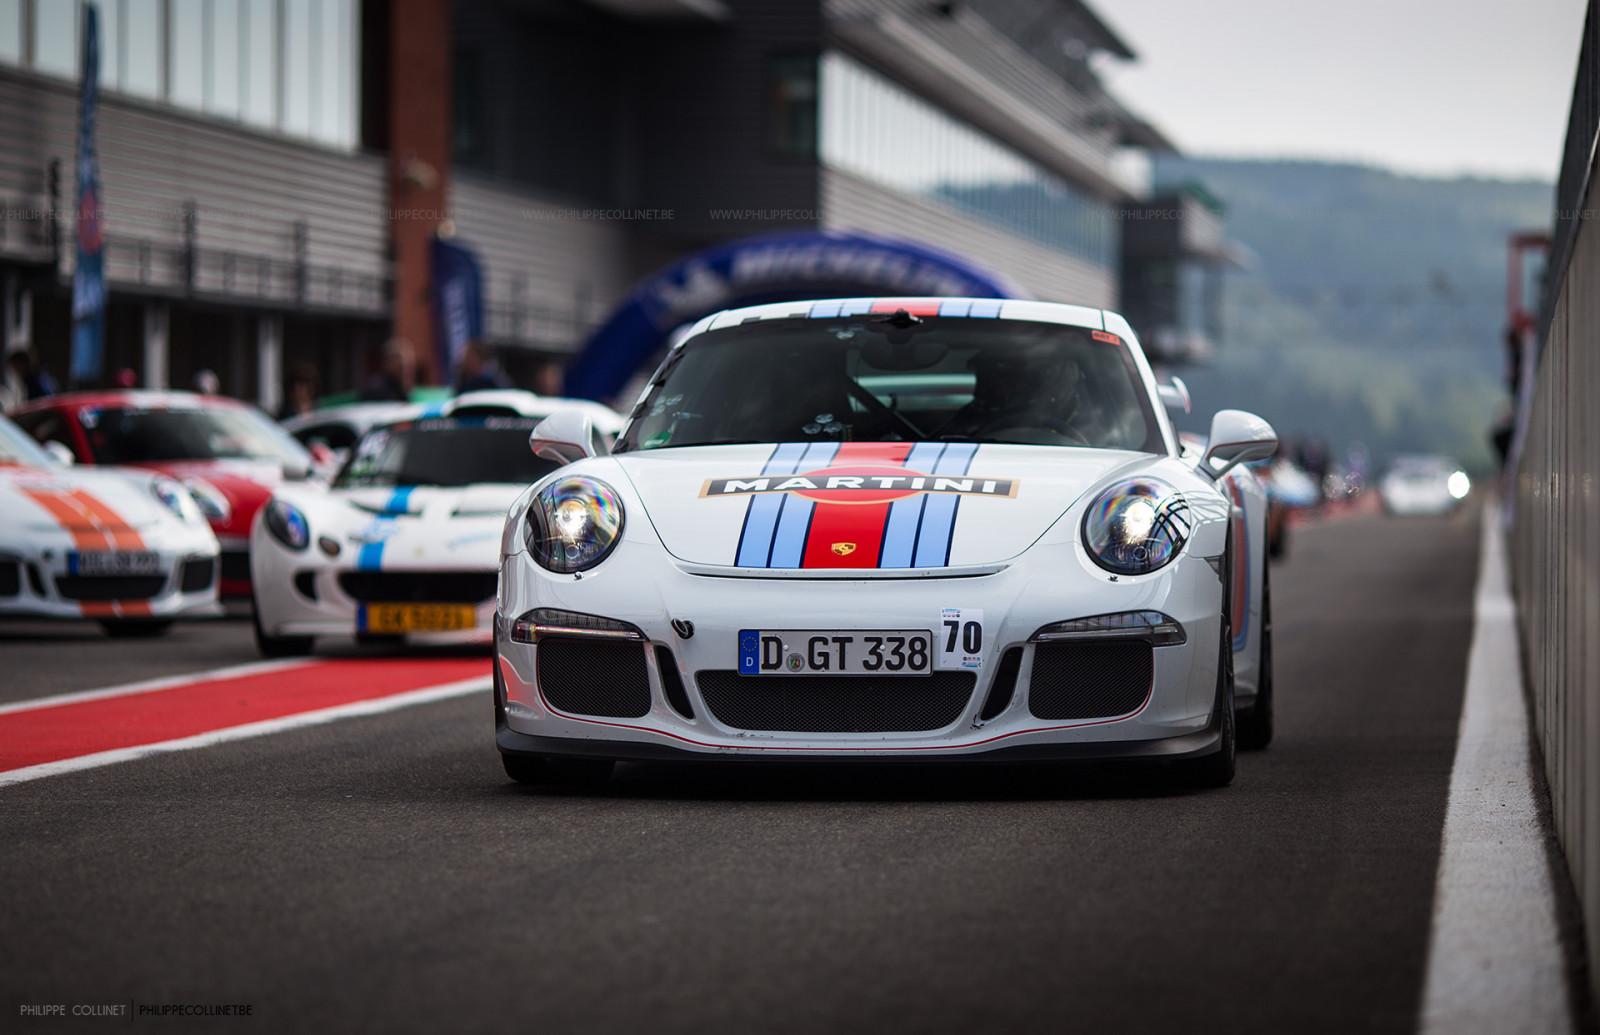 Wallpaper Sports Car Automotive Design Supercar Performance Racing Technology Porsche 911 GT3 Luxury Vehicle Auto